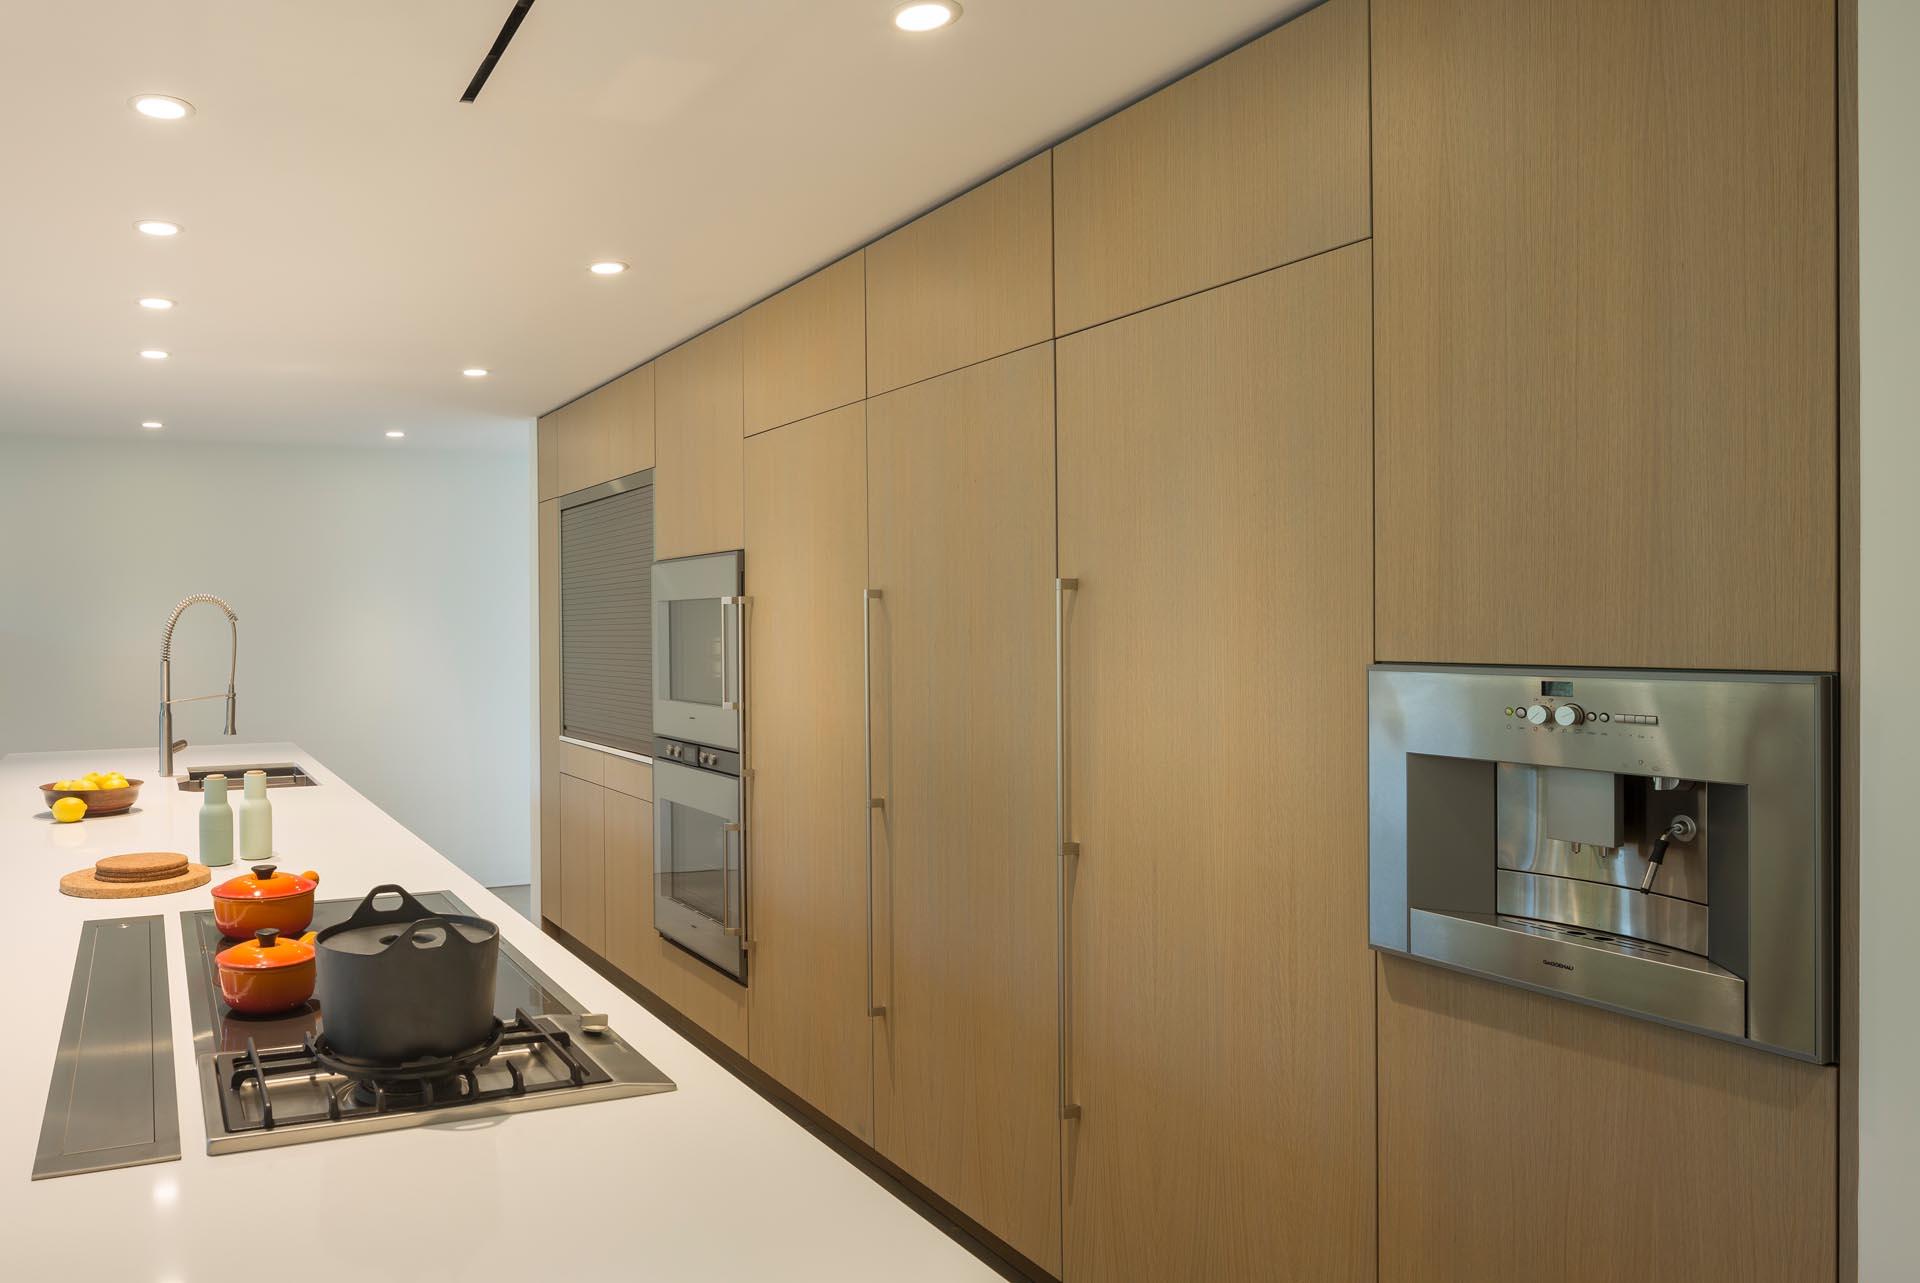 A modern kitchen with minimalist wood cabinets.